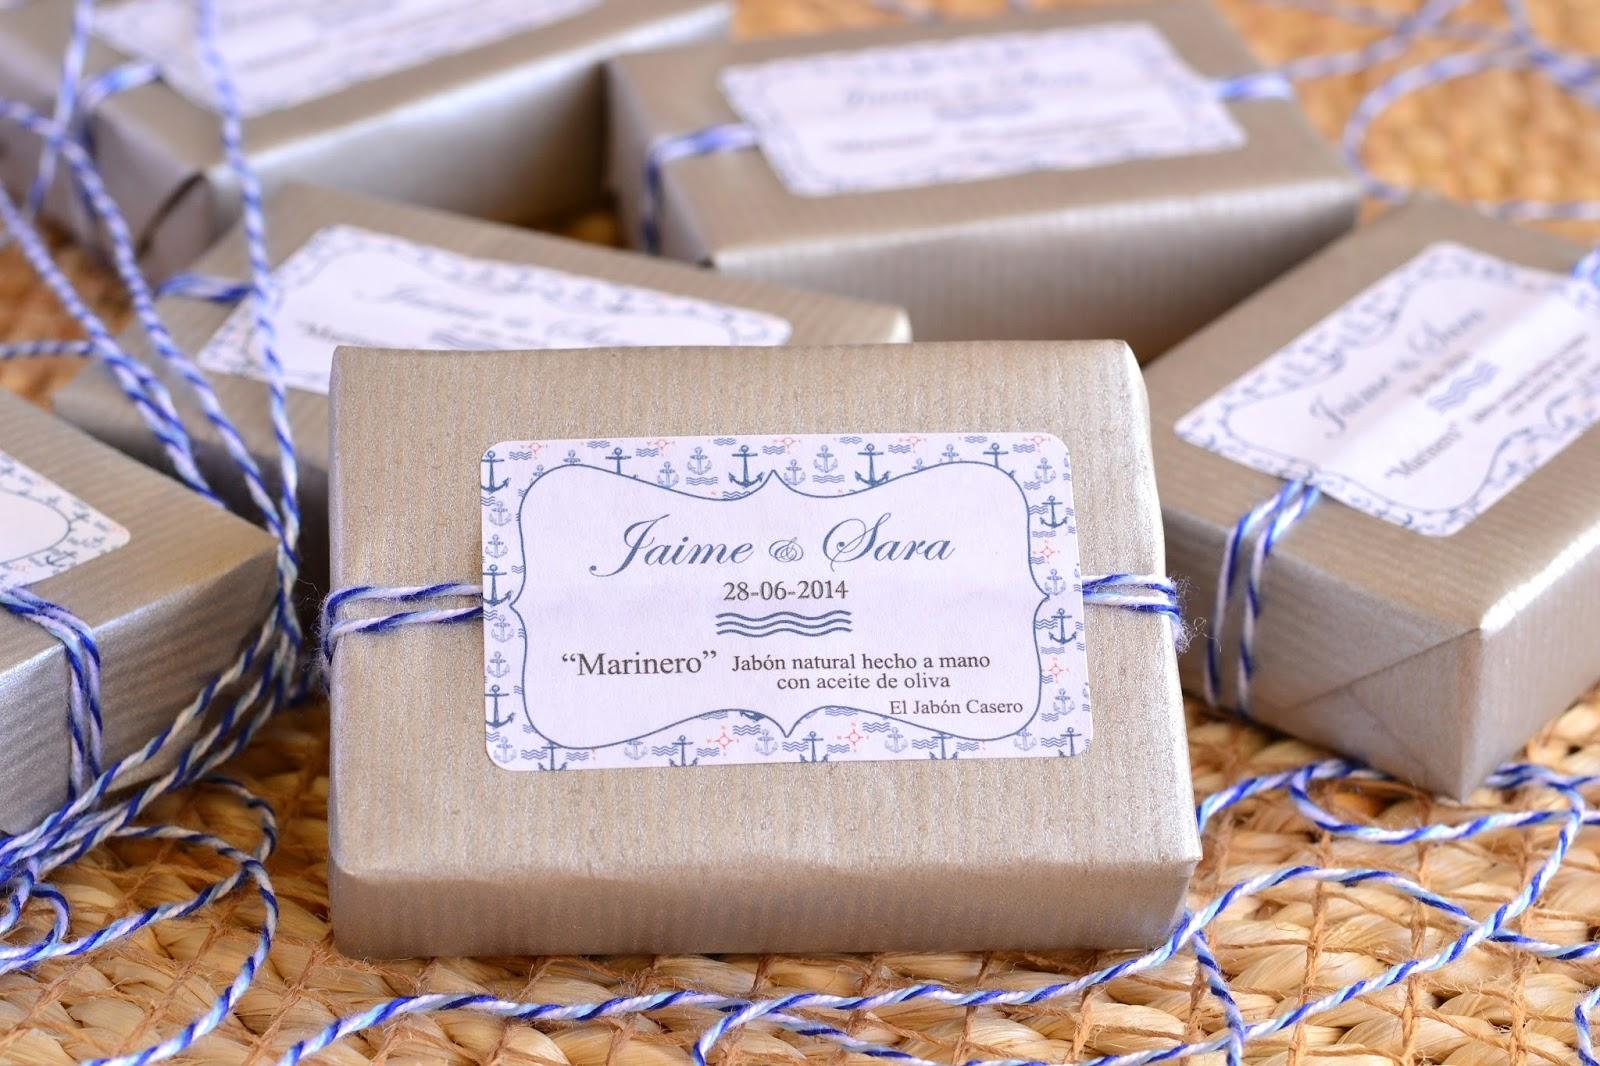 Detalles de boda playa jabones naturales el jabon casero